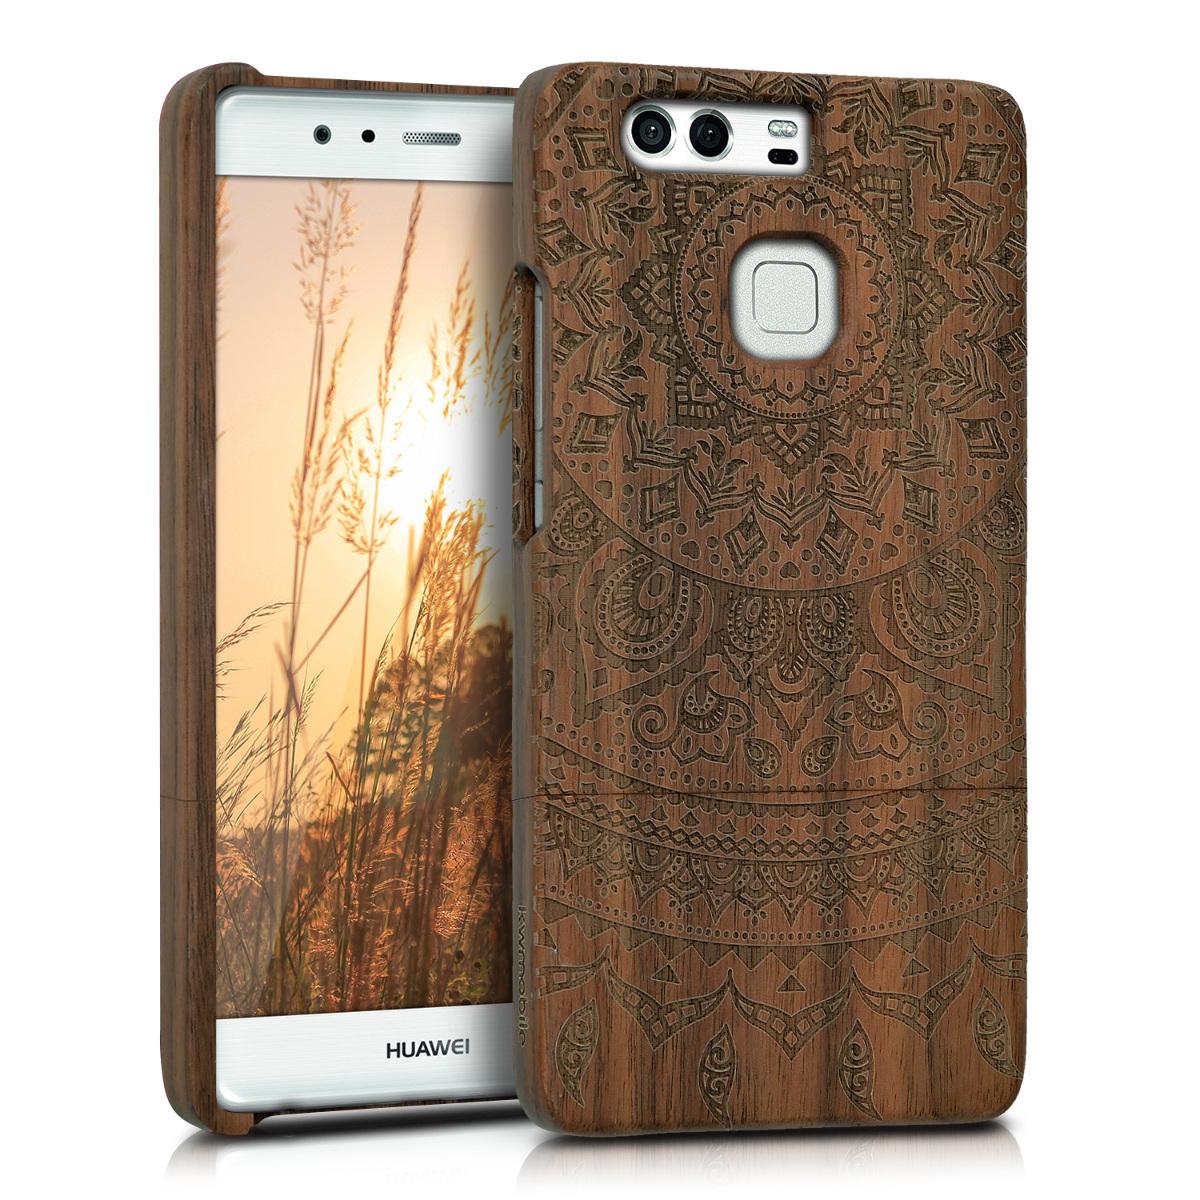 KW Ξύλινη Θήκη Huawei P9 - Brown  (39126.02)